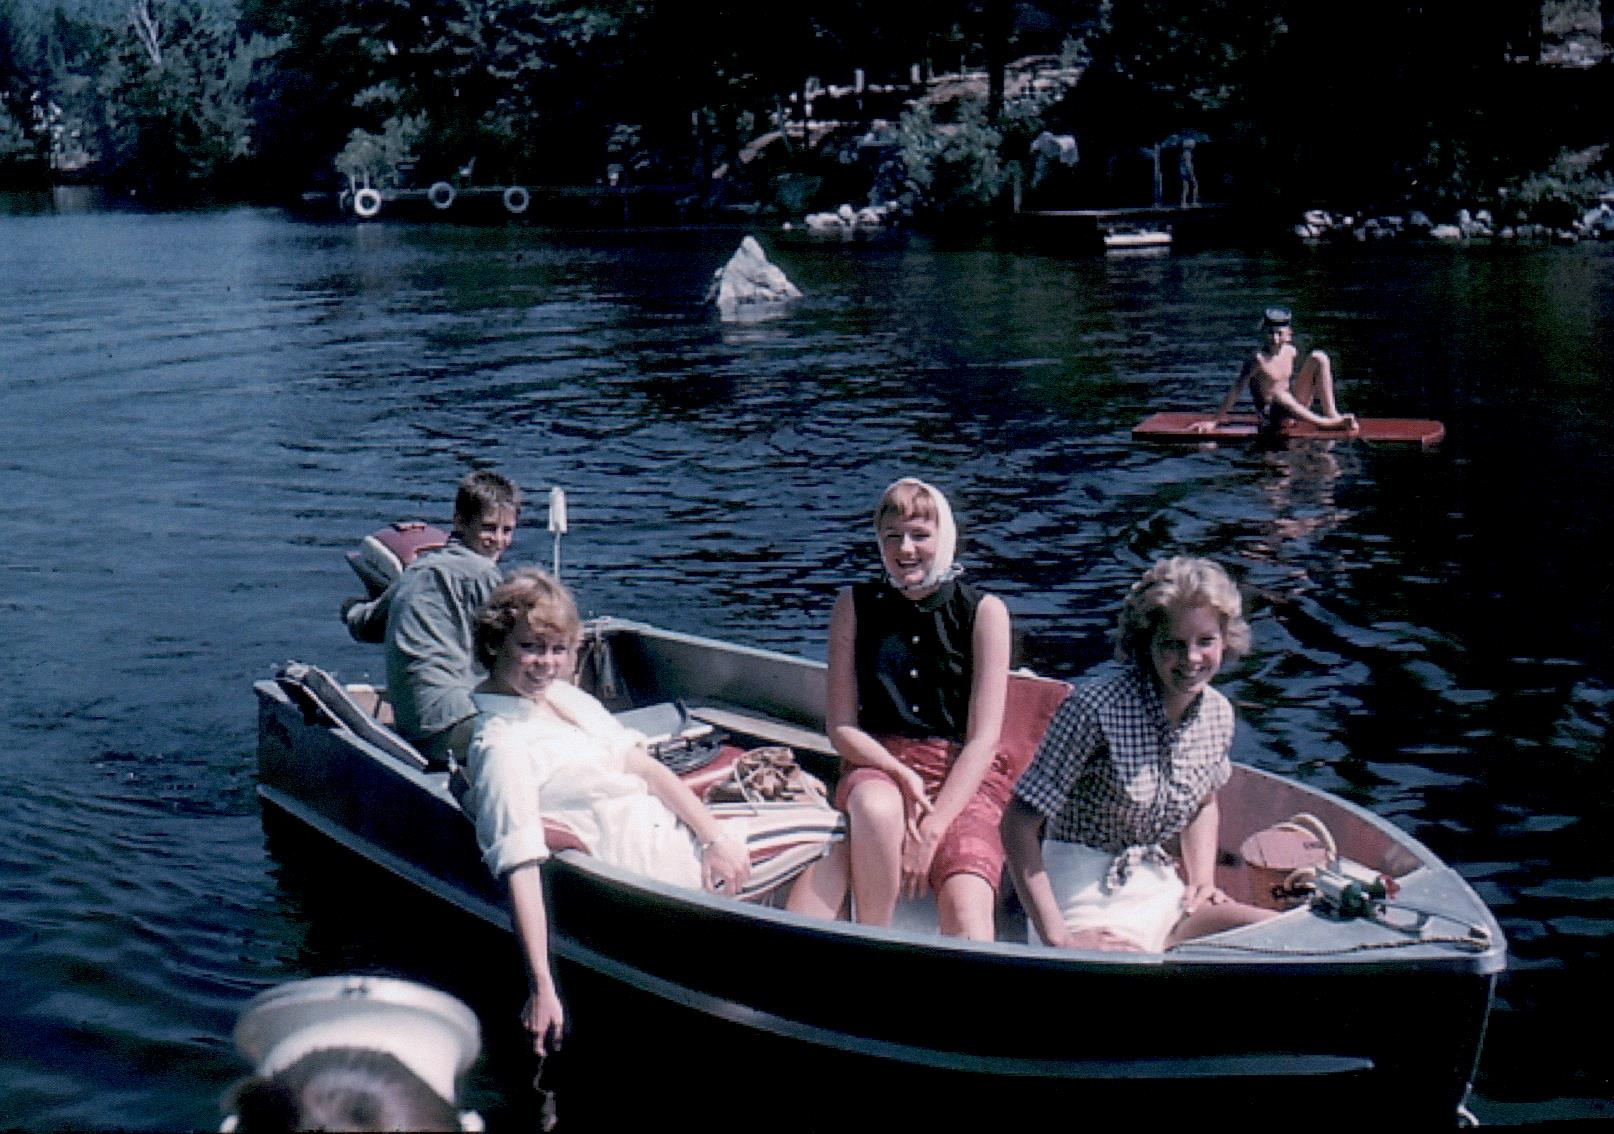 Spring Island - Greg Guion, Nancy Hayden, Susie Linsley, Judy Guion @ 1960s - (Lad)